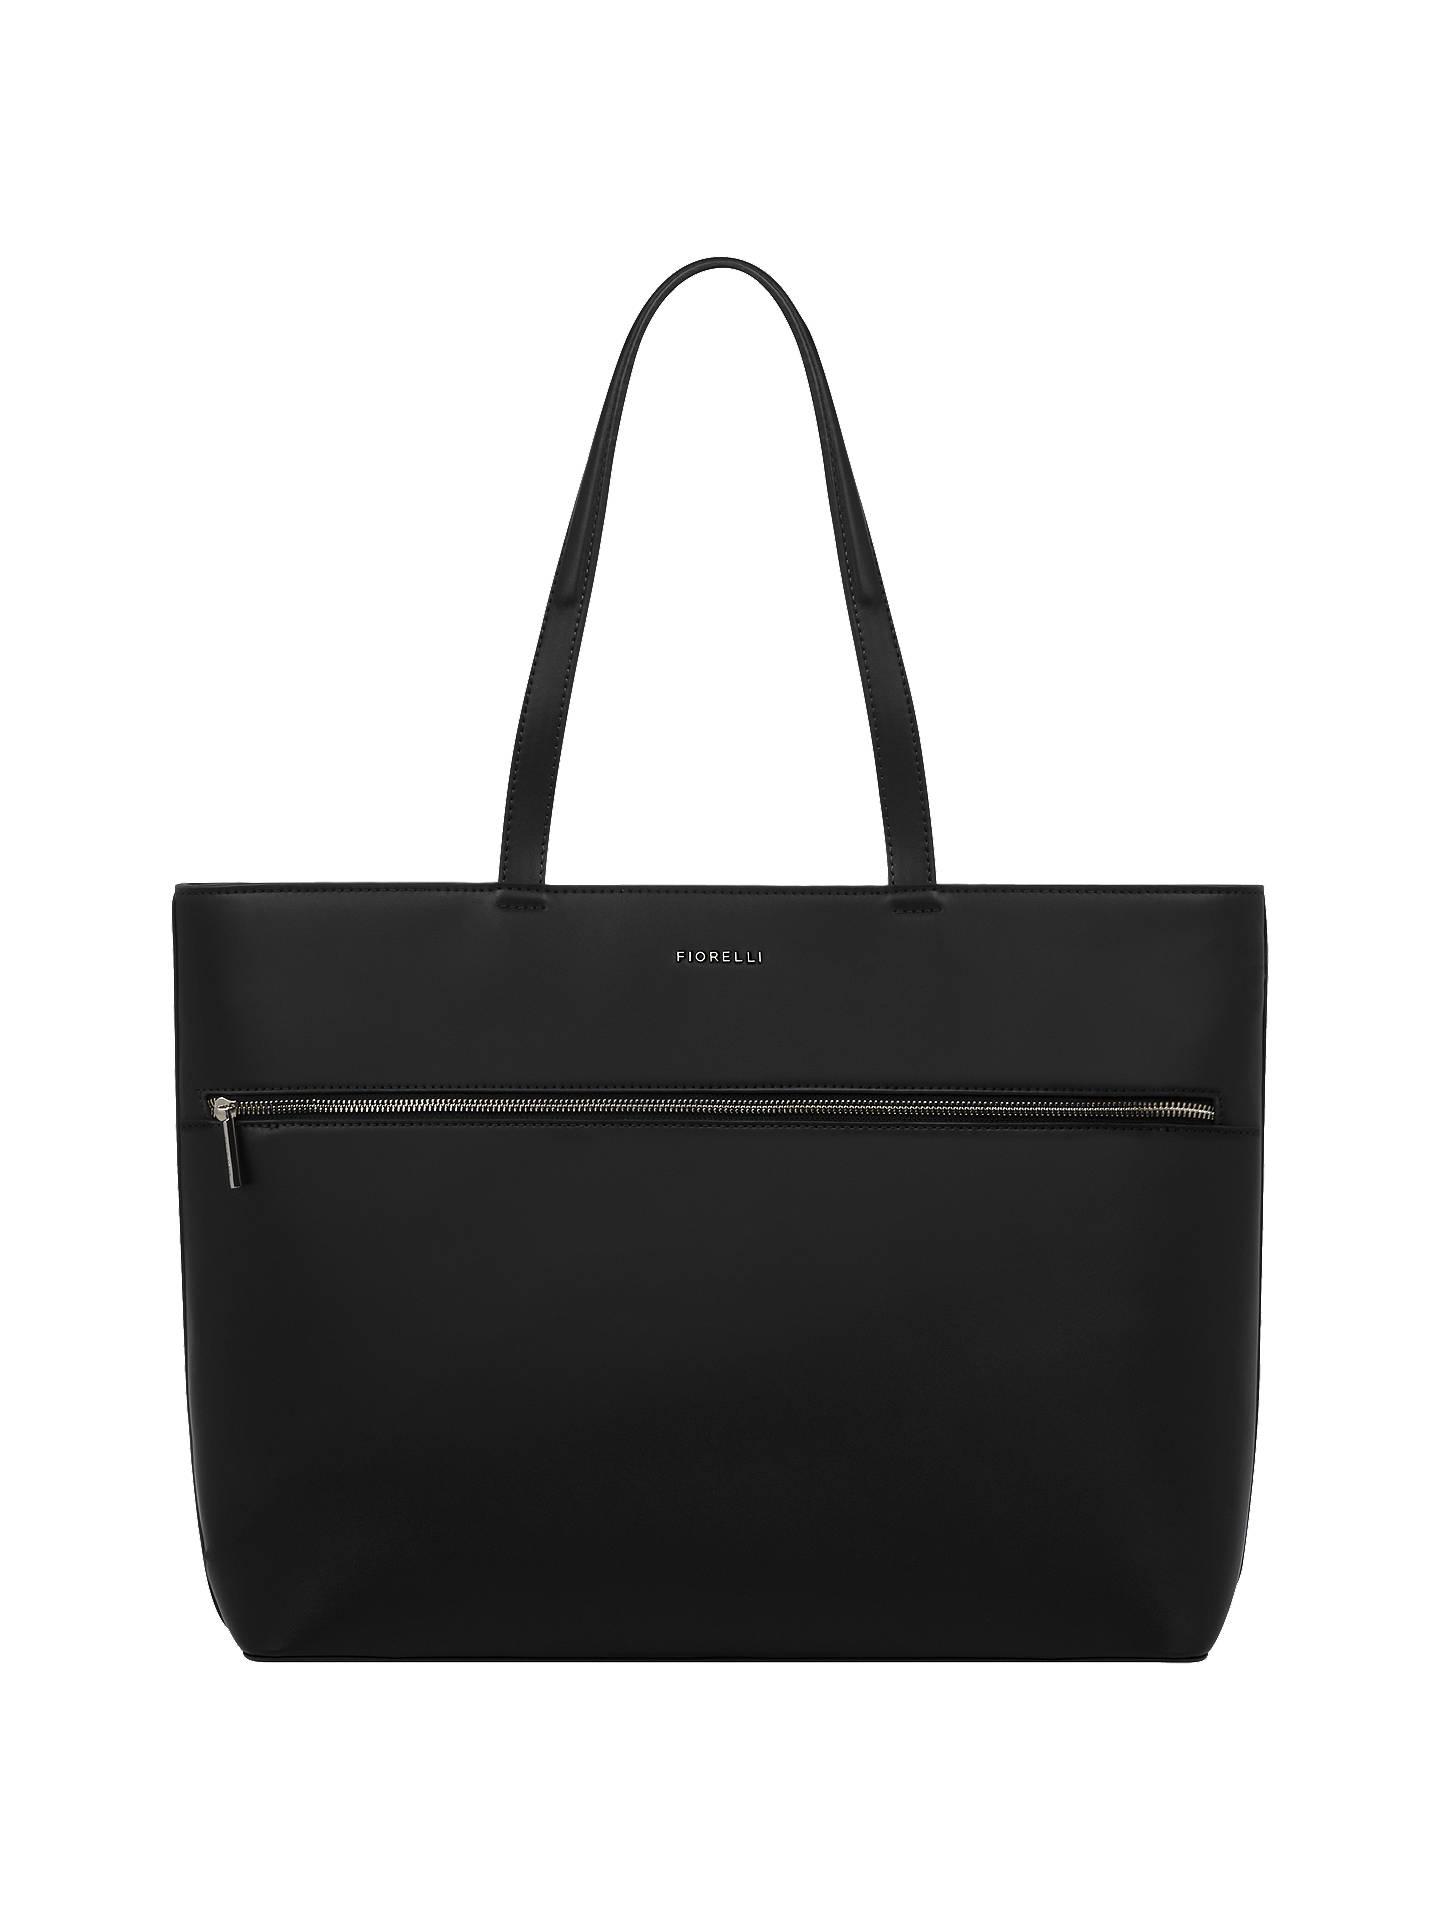 Fiorelli City Tote Bag Black Online At Johnlewis